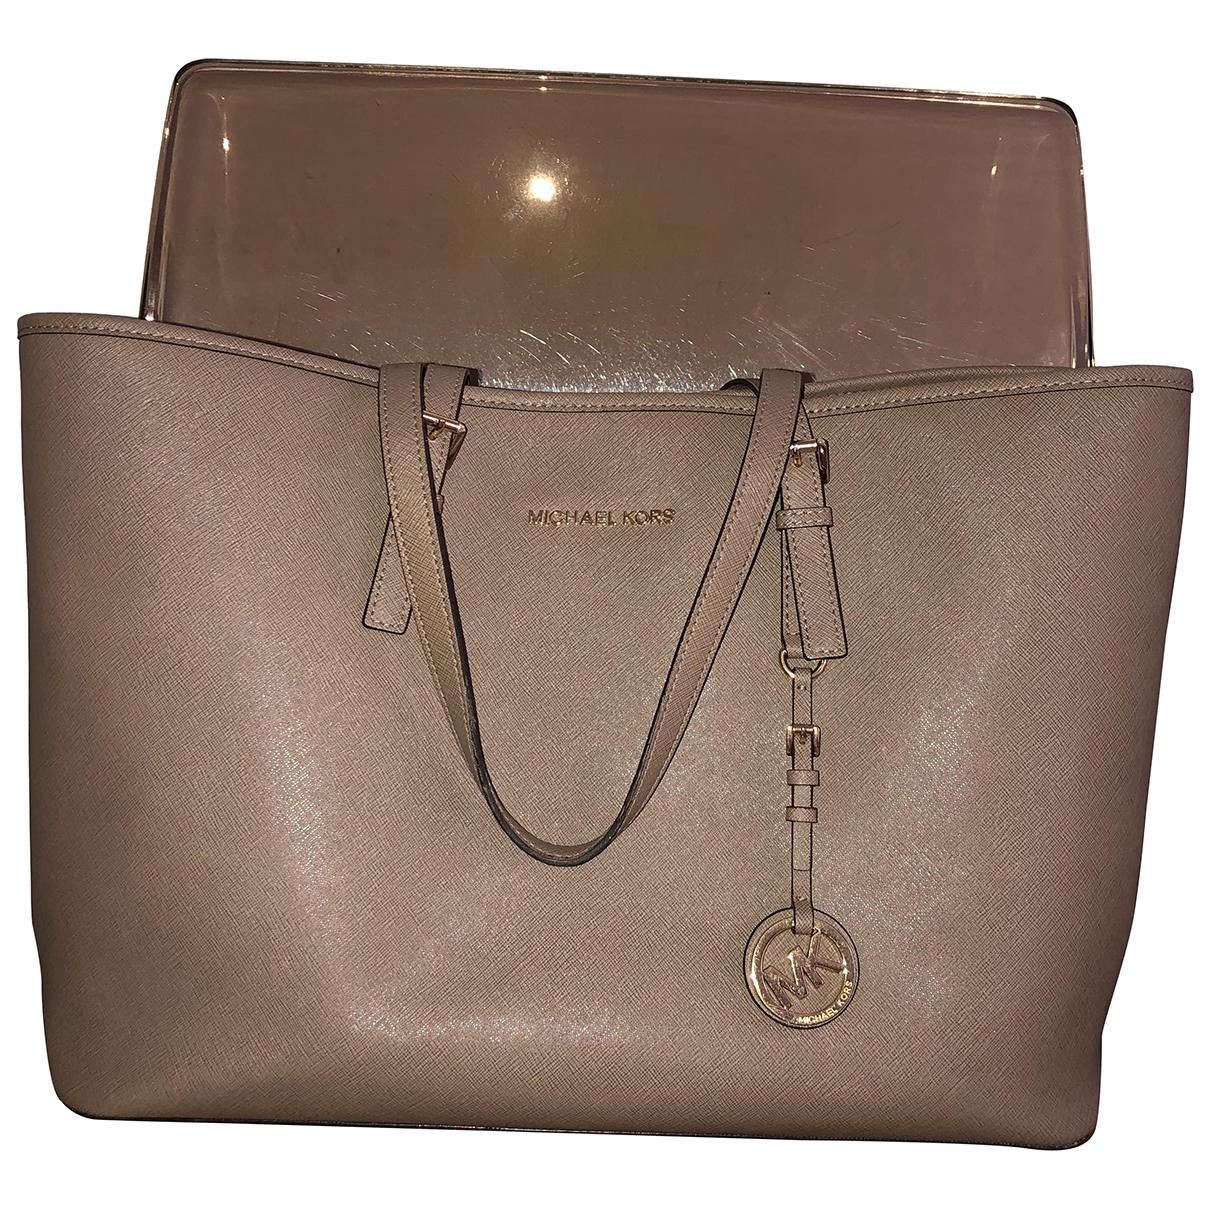 Michael Kors Jet Set Grey Leather handbag for Women N